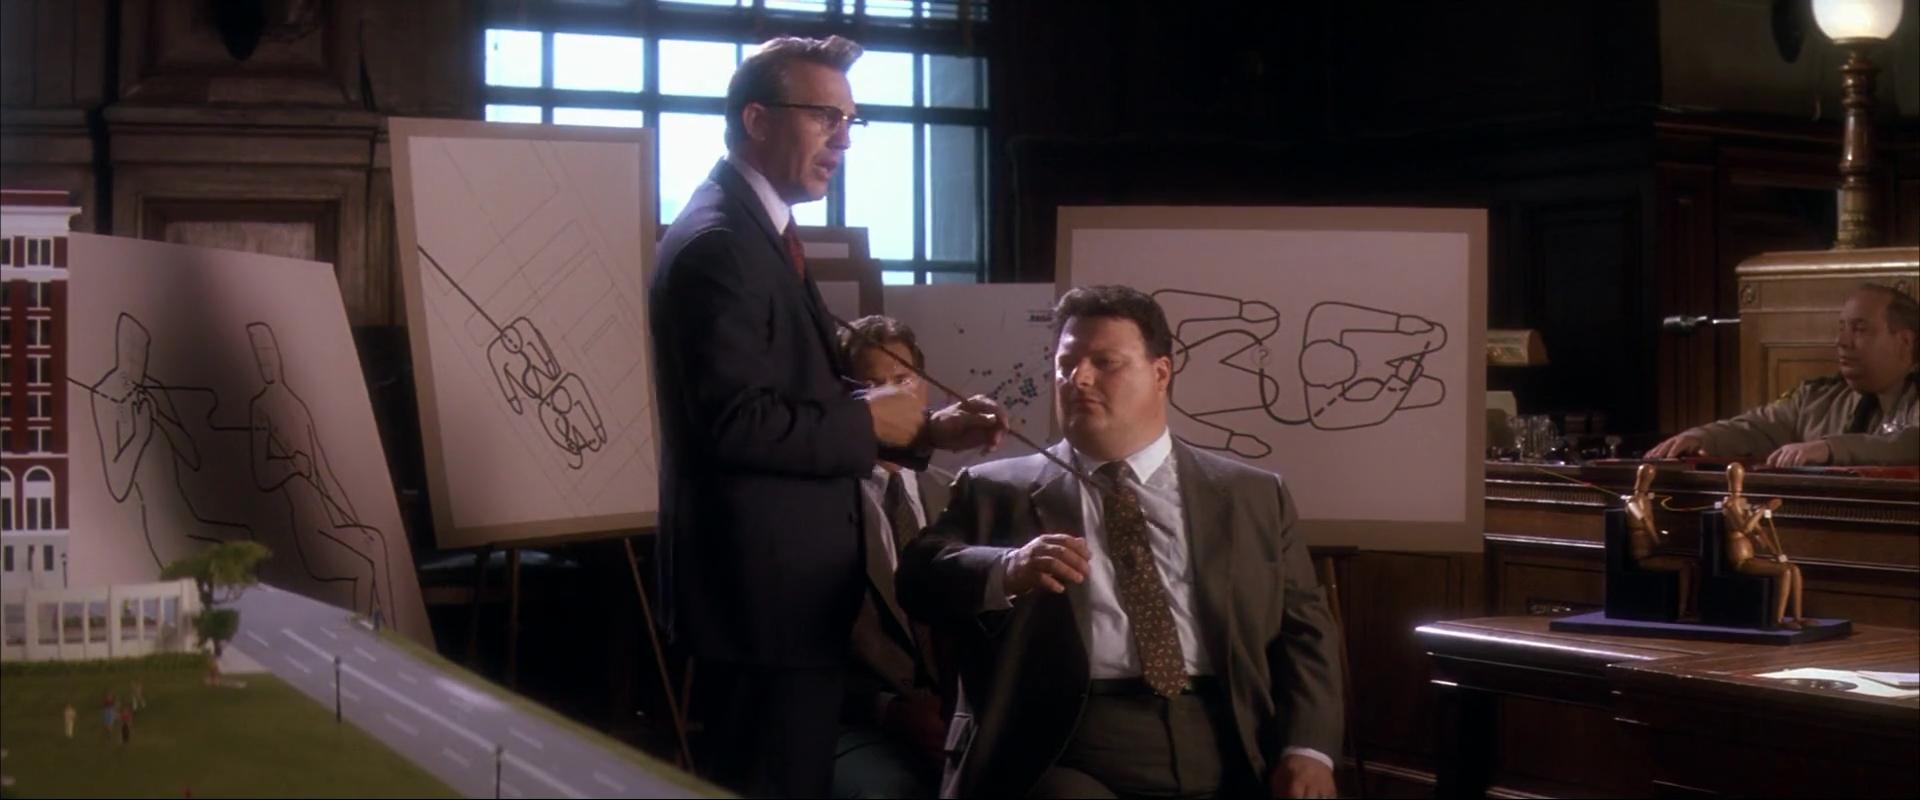 Kevin Costner, Wayne Knight, and Gary Grubbs in JFK (1991)